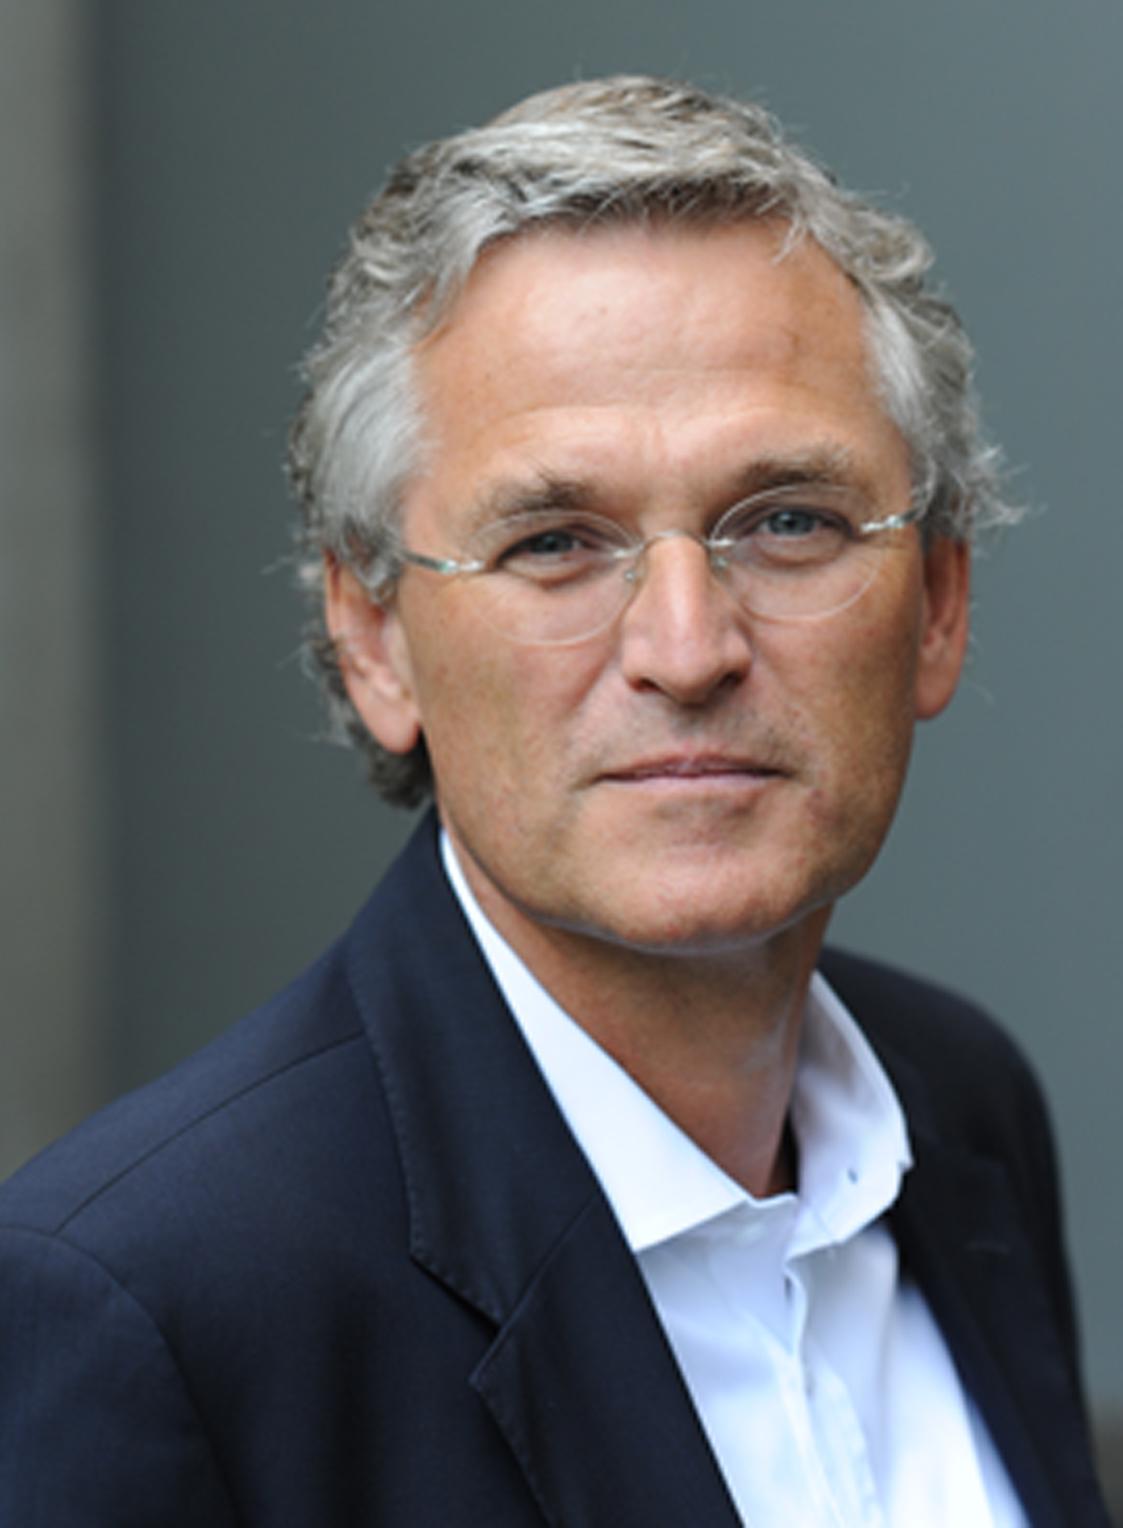 ... daneben sitzt ZDF-Chefredakteur Elmar Theveßen. Bild: Helmut Kunz